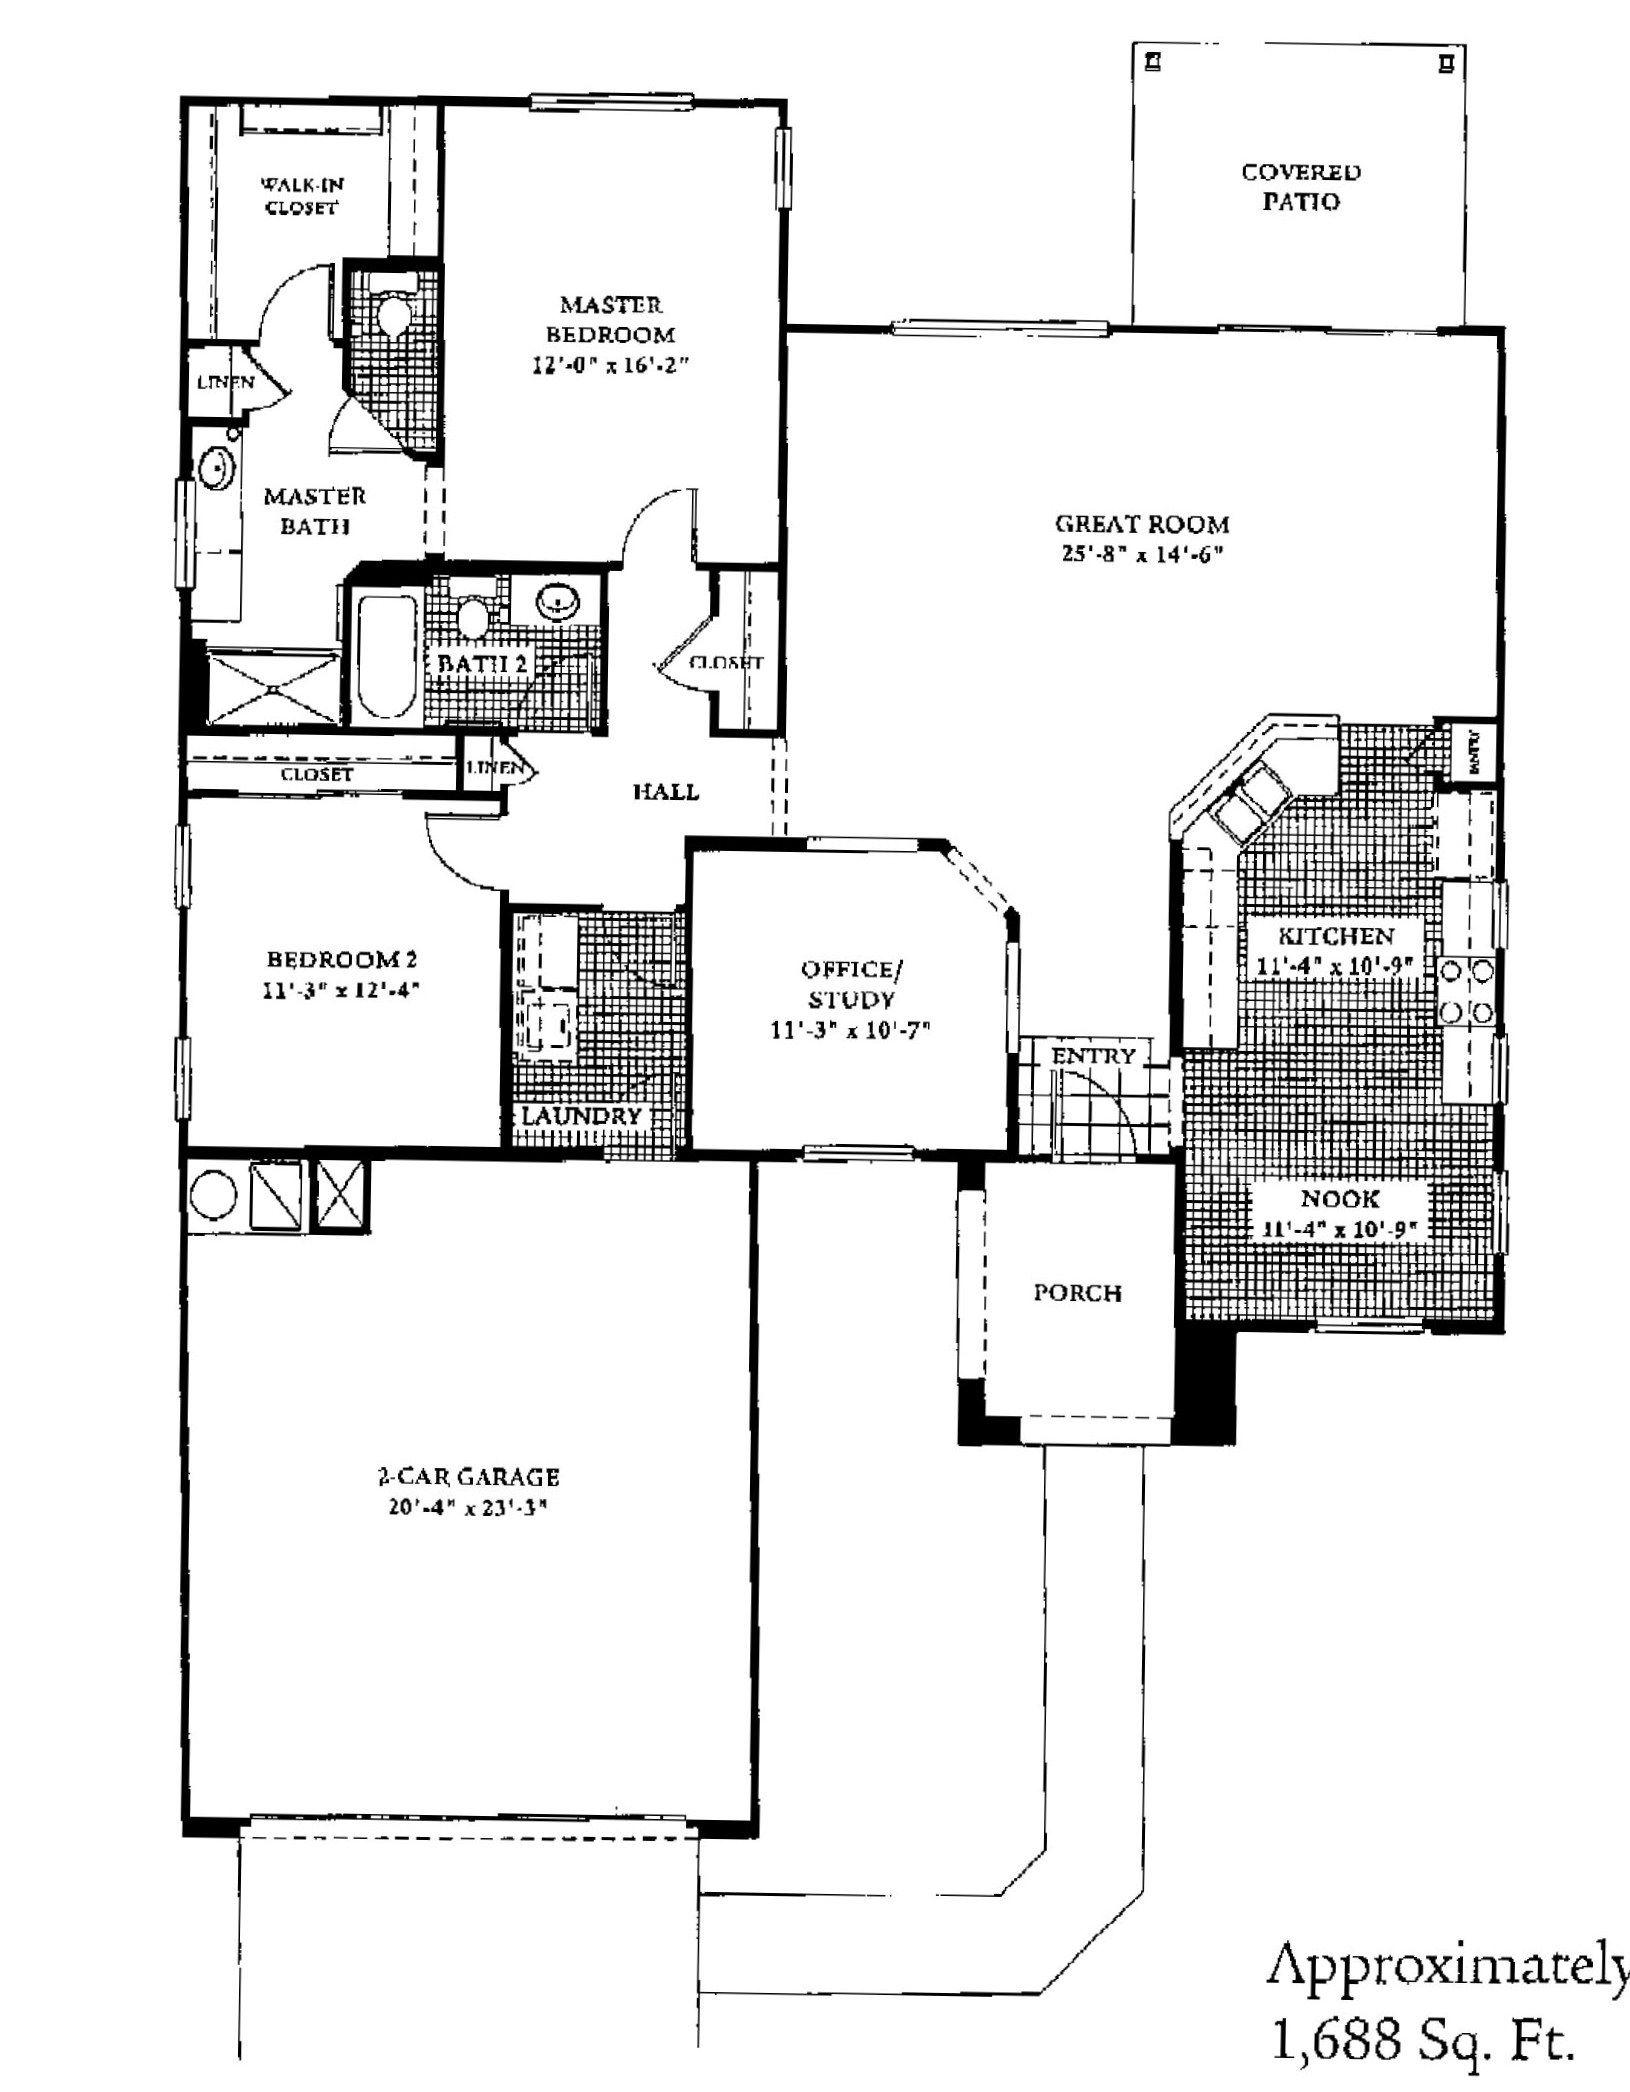 Sun City Grand Sycamore Floor Plan Del Webb Sun City Grand Floor Plan Model Home House Plans Floorplans Models In Surprise Ph Floor Plans Sun City Model Homes